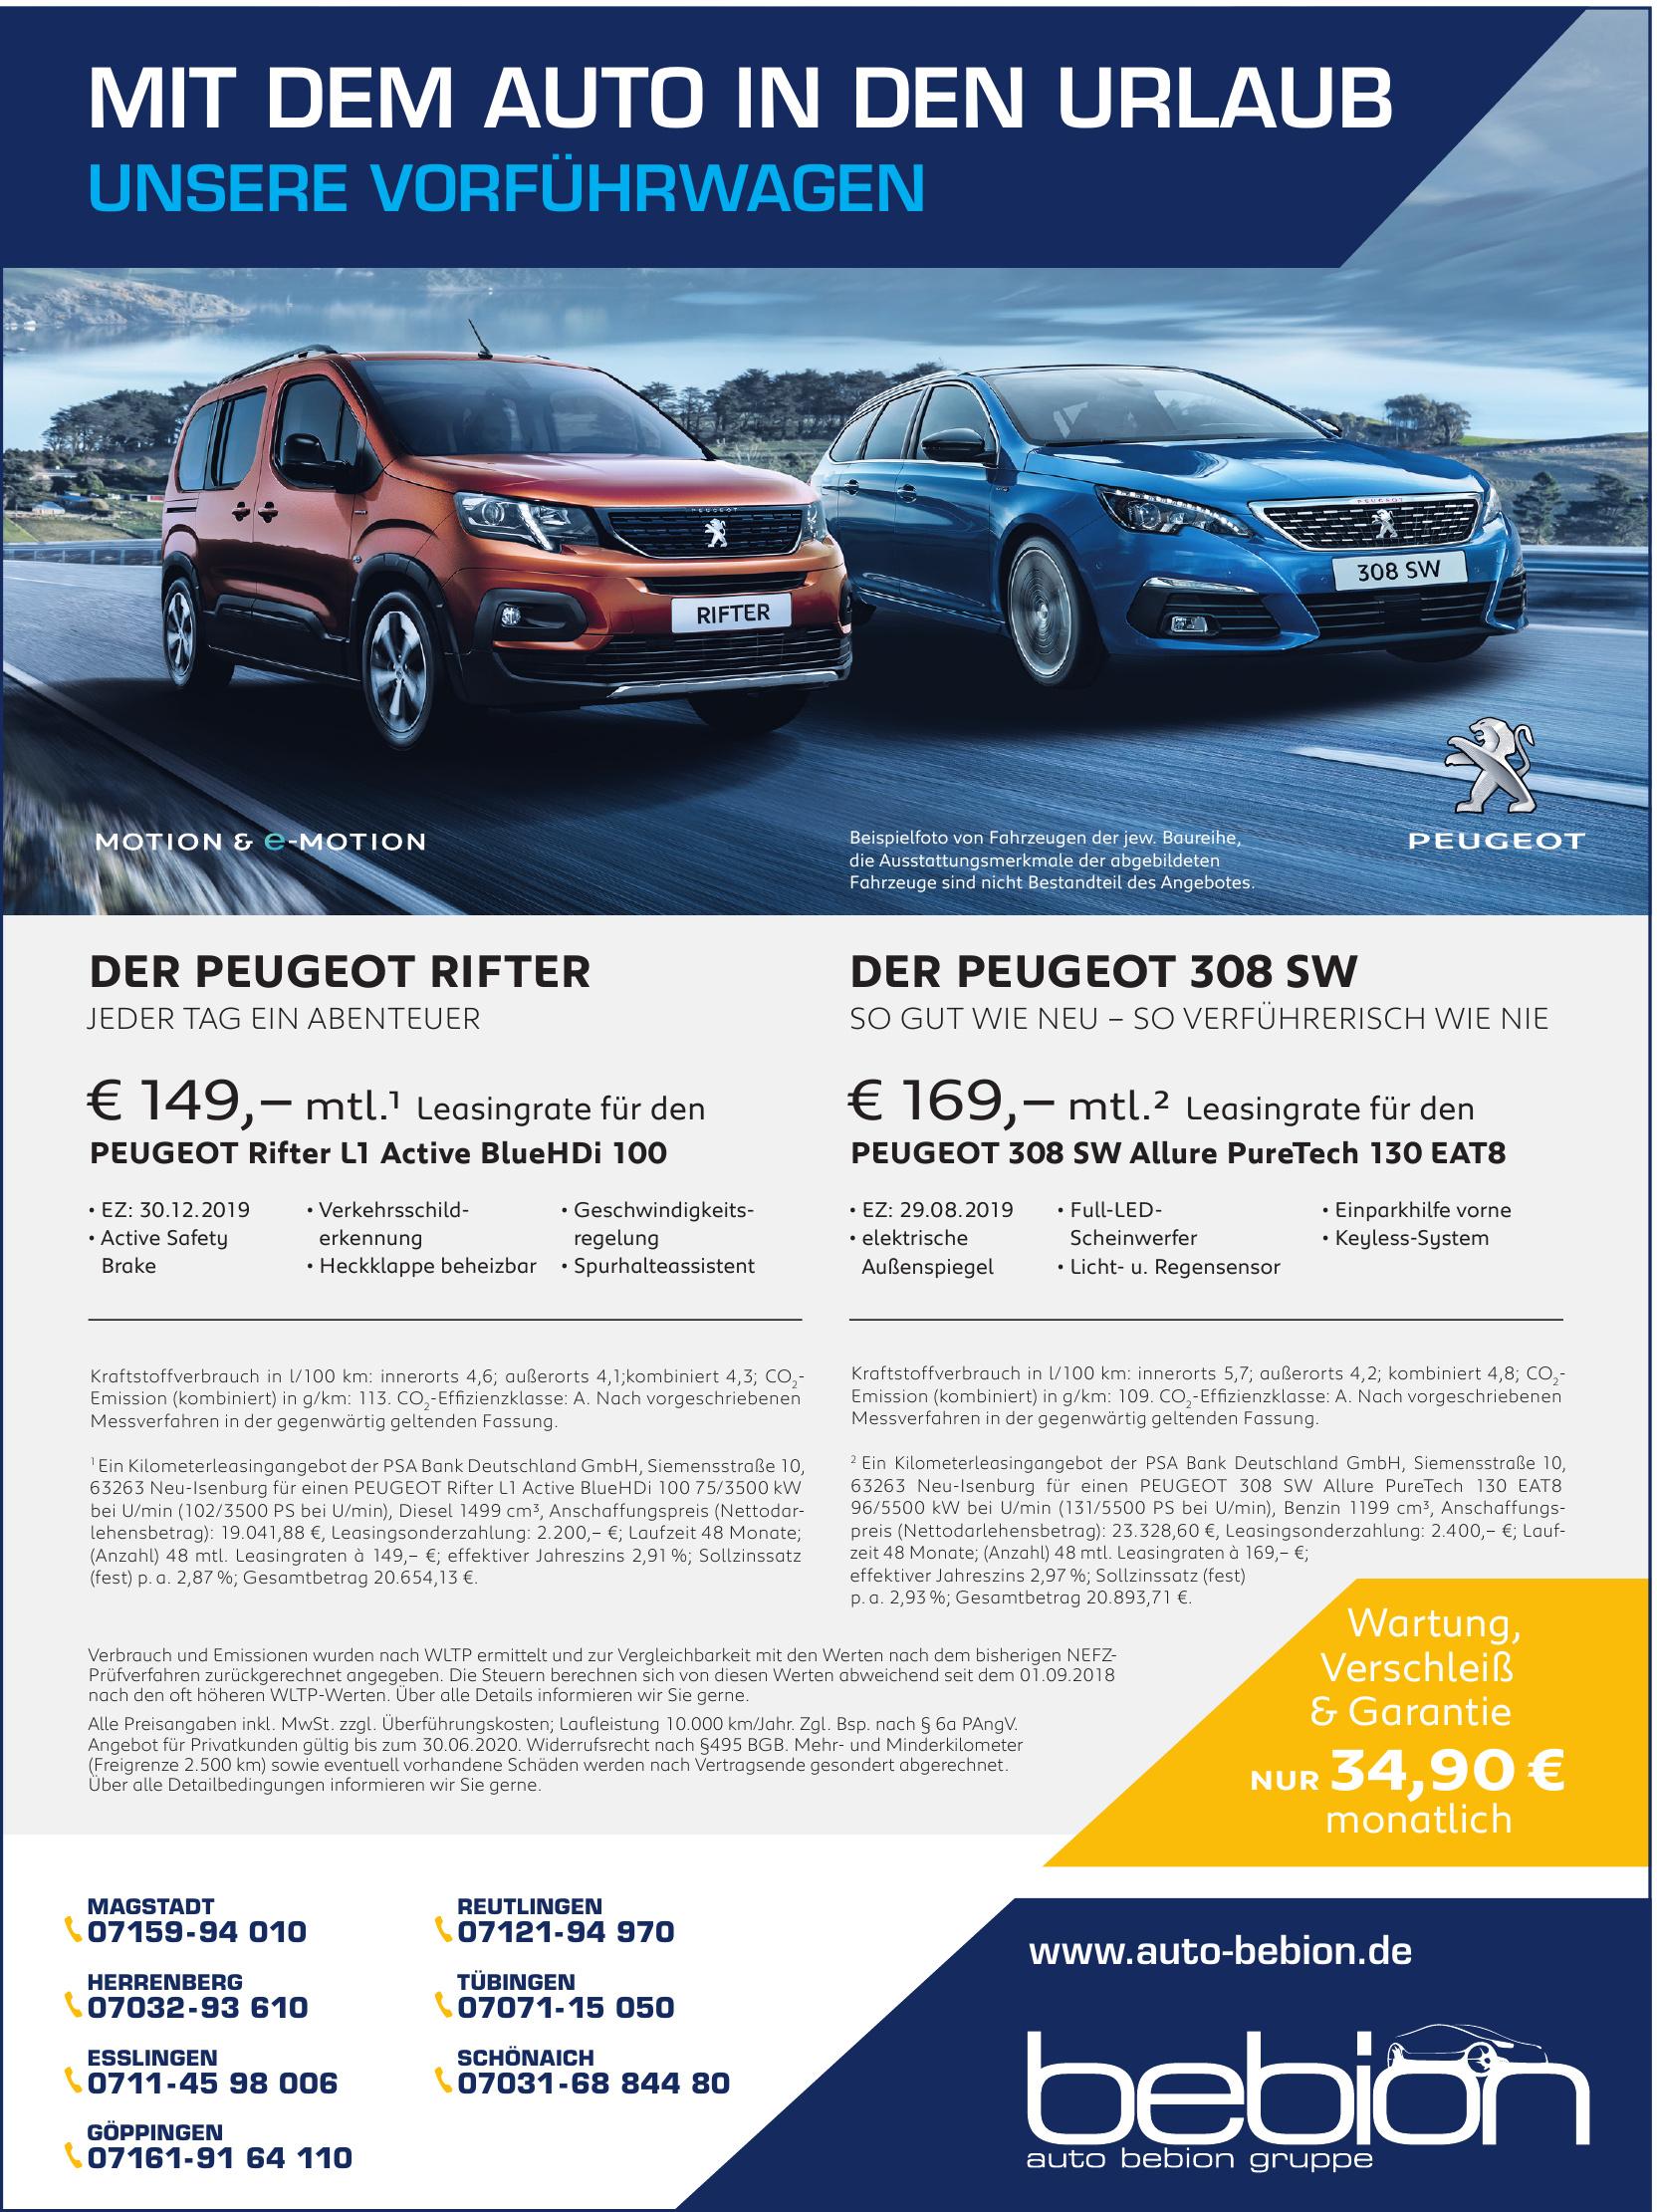 Auto Bebion GmbH